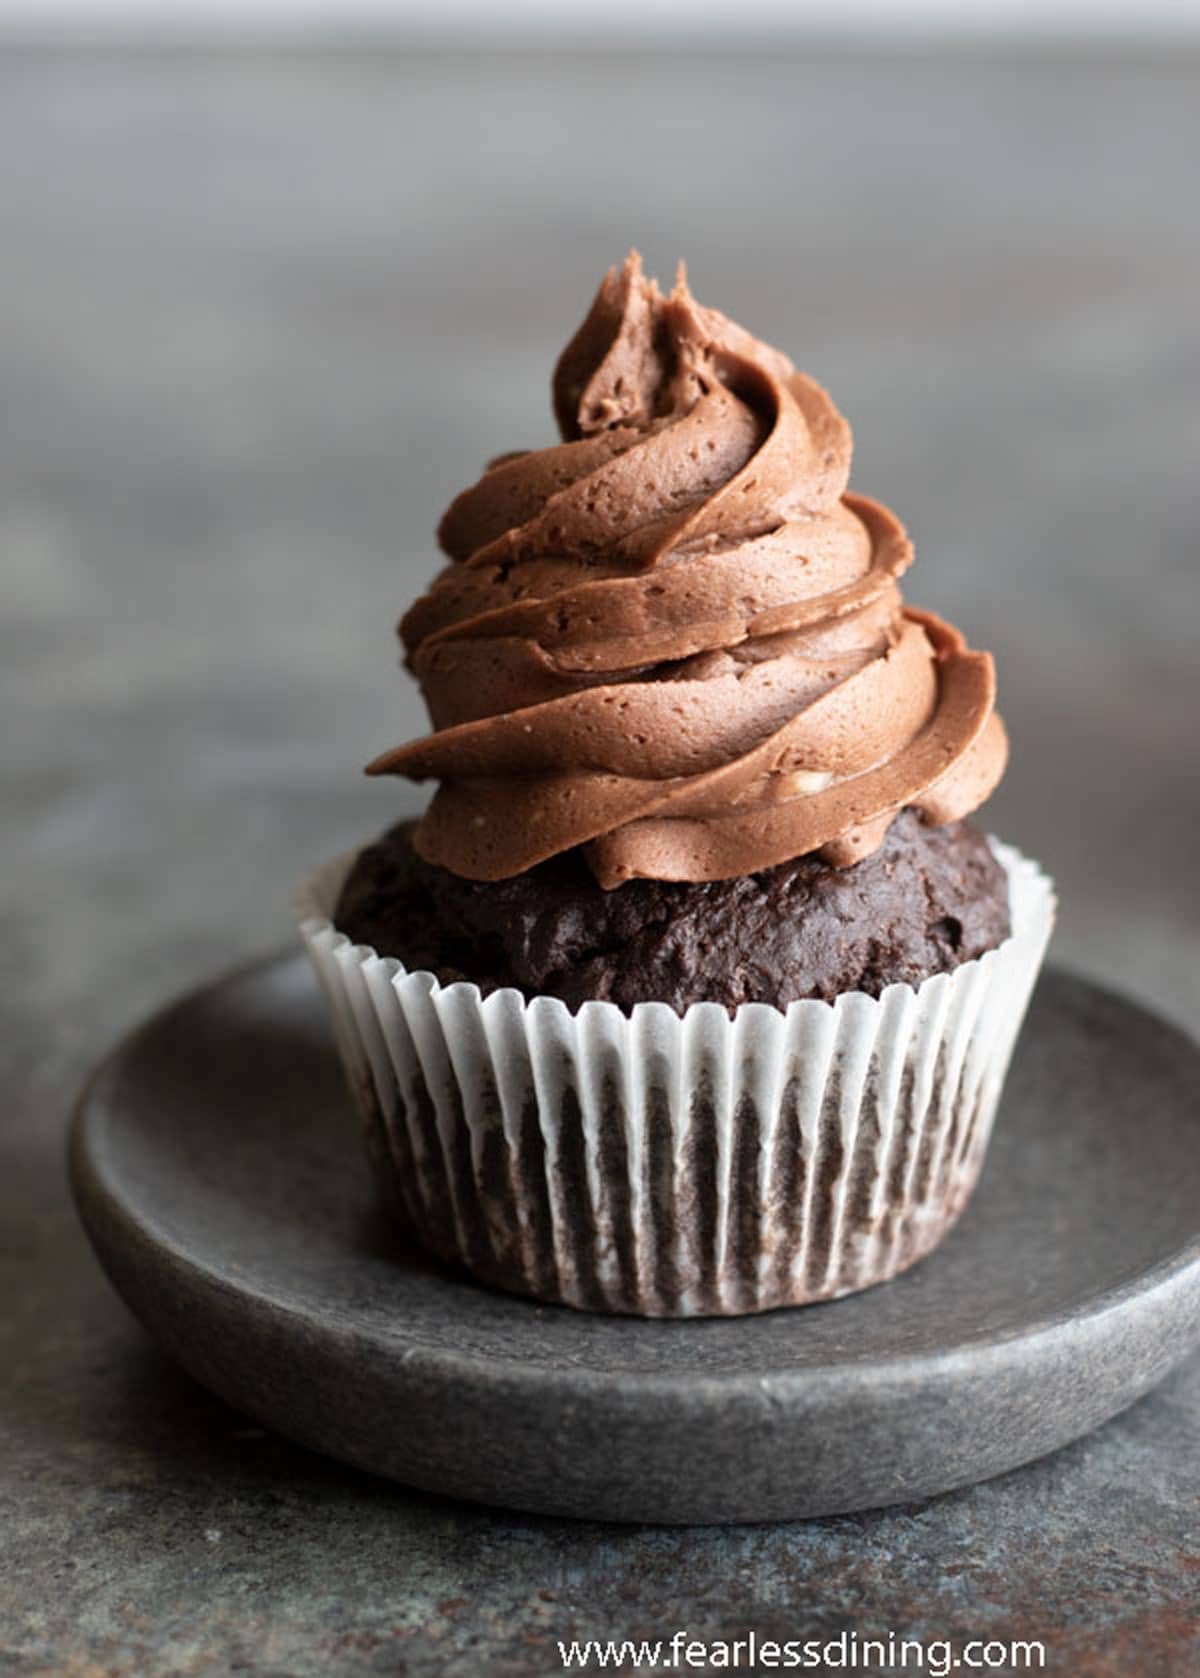 a single chocolate cupcake on a charcoal grey plate